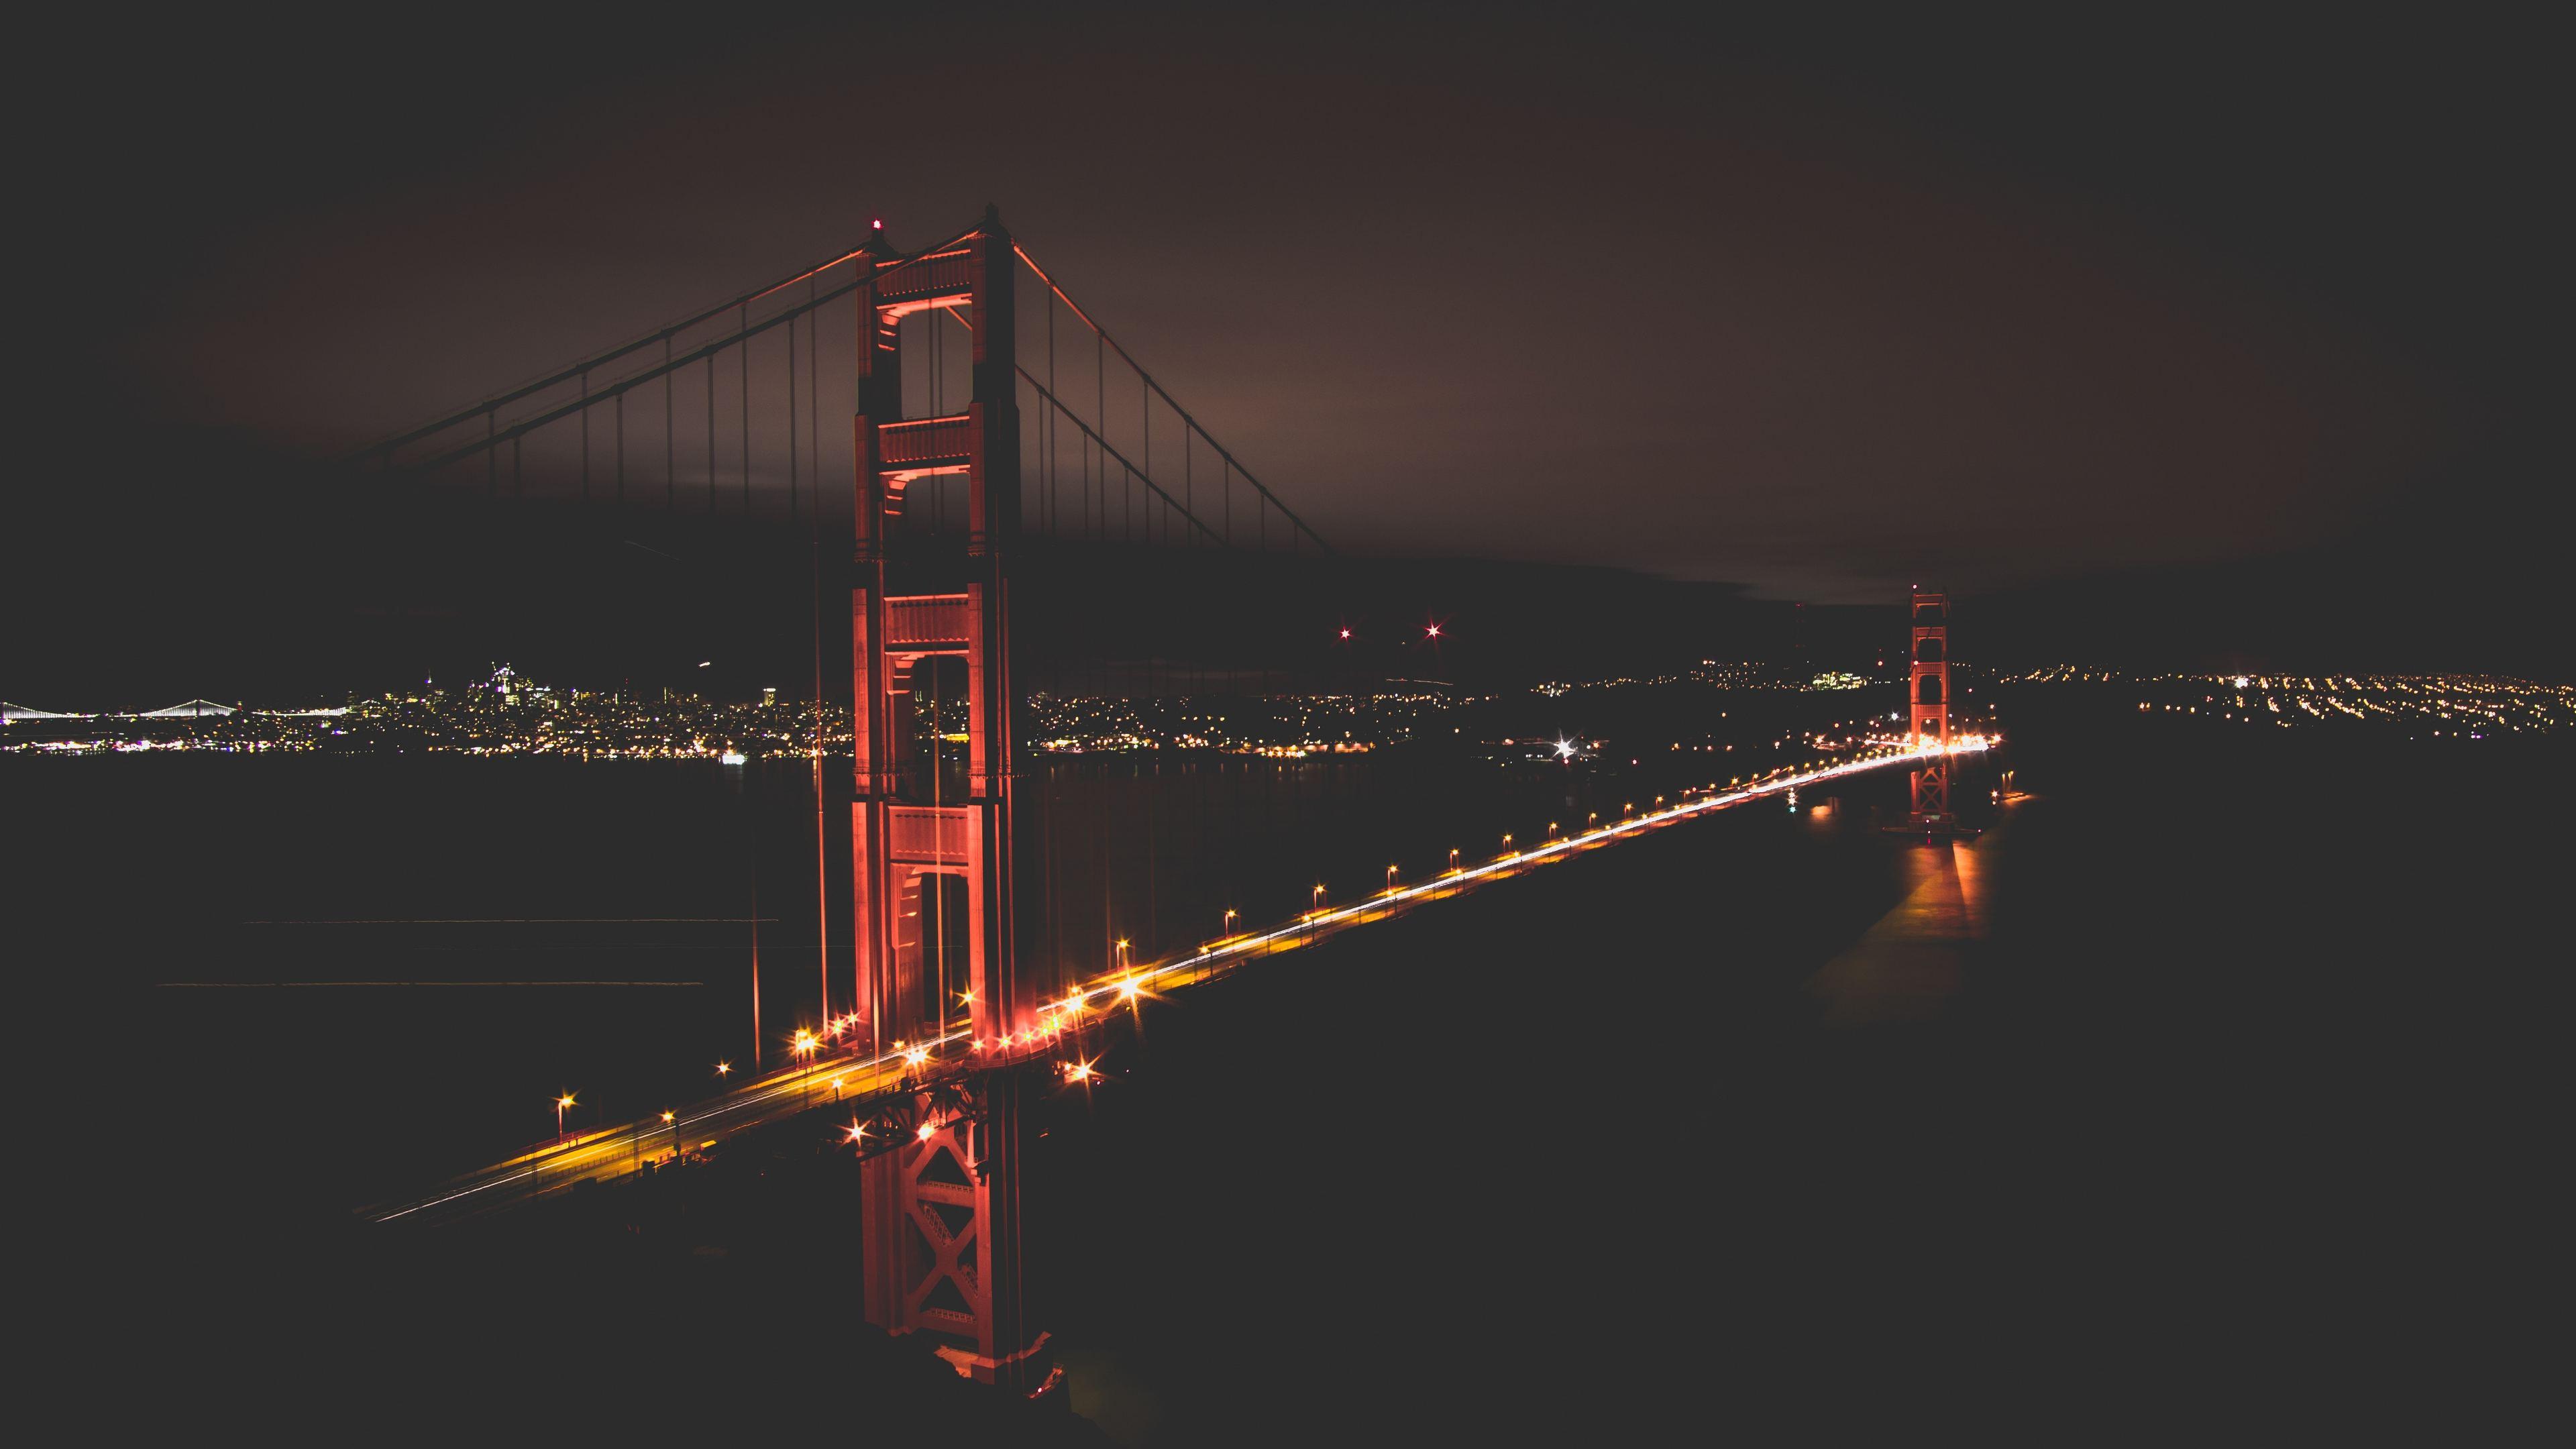 golden gate bridge at night time 1538072121 - Golden Gate Bridge At Night Time - world wallpapers, san francisco wallpapers, hd-wallpapers, golden gate bridge wallpapers, bridge wallpapers, 5k wallpapers, 4k-wallpapers